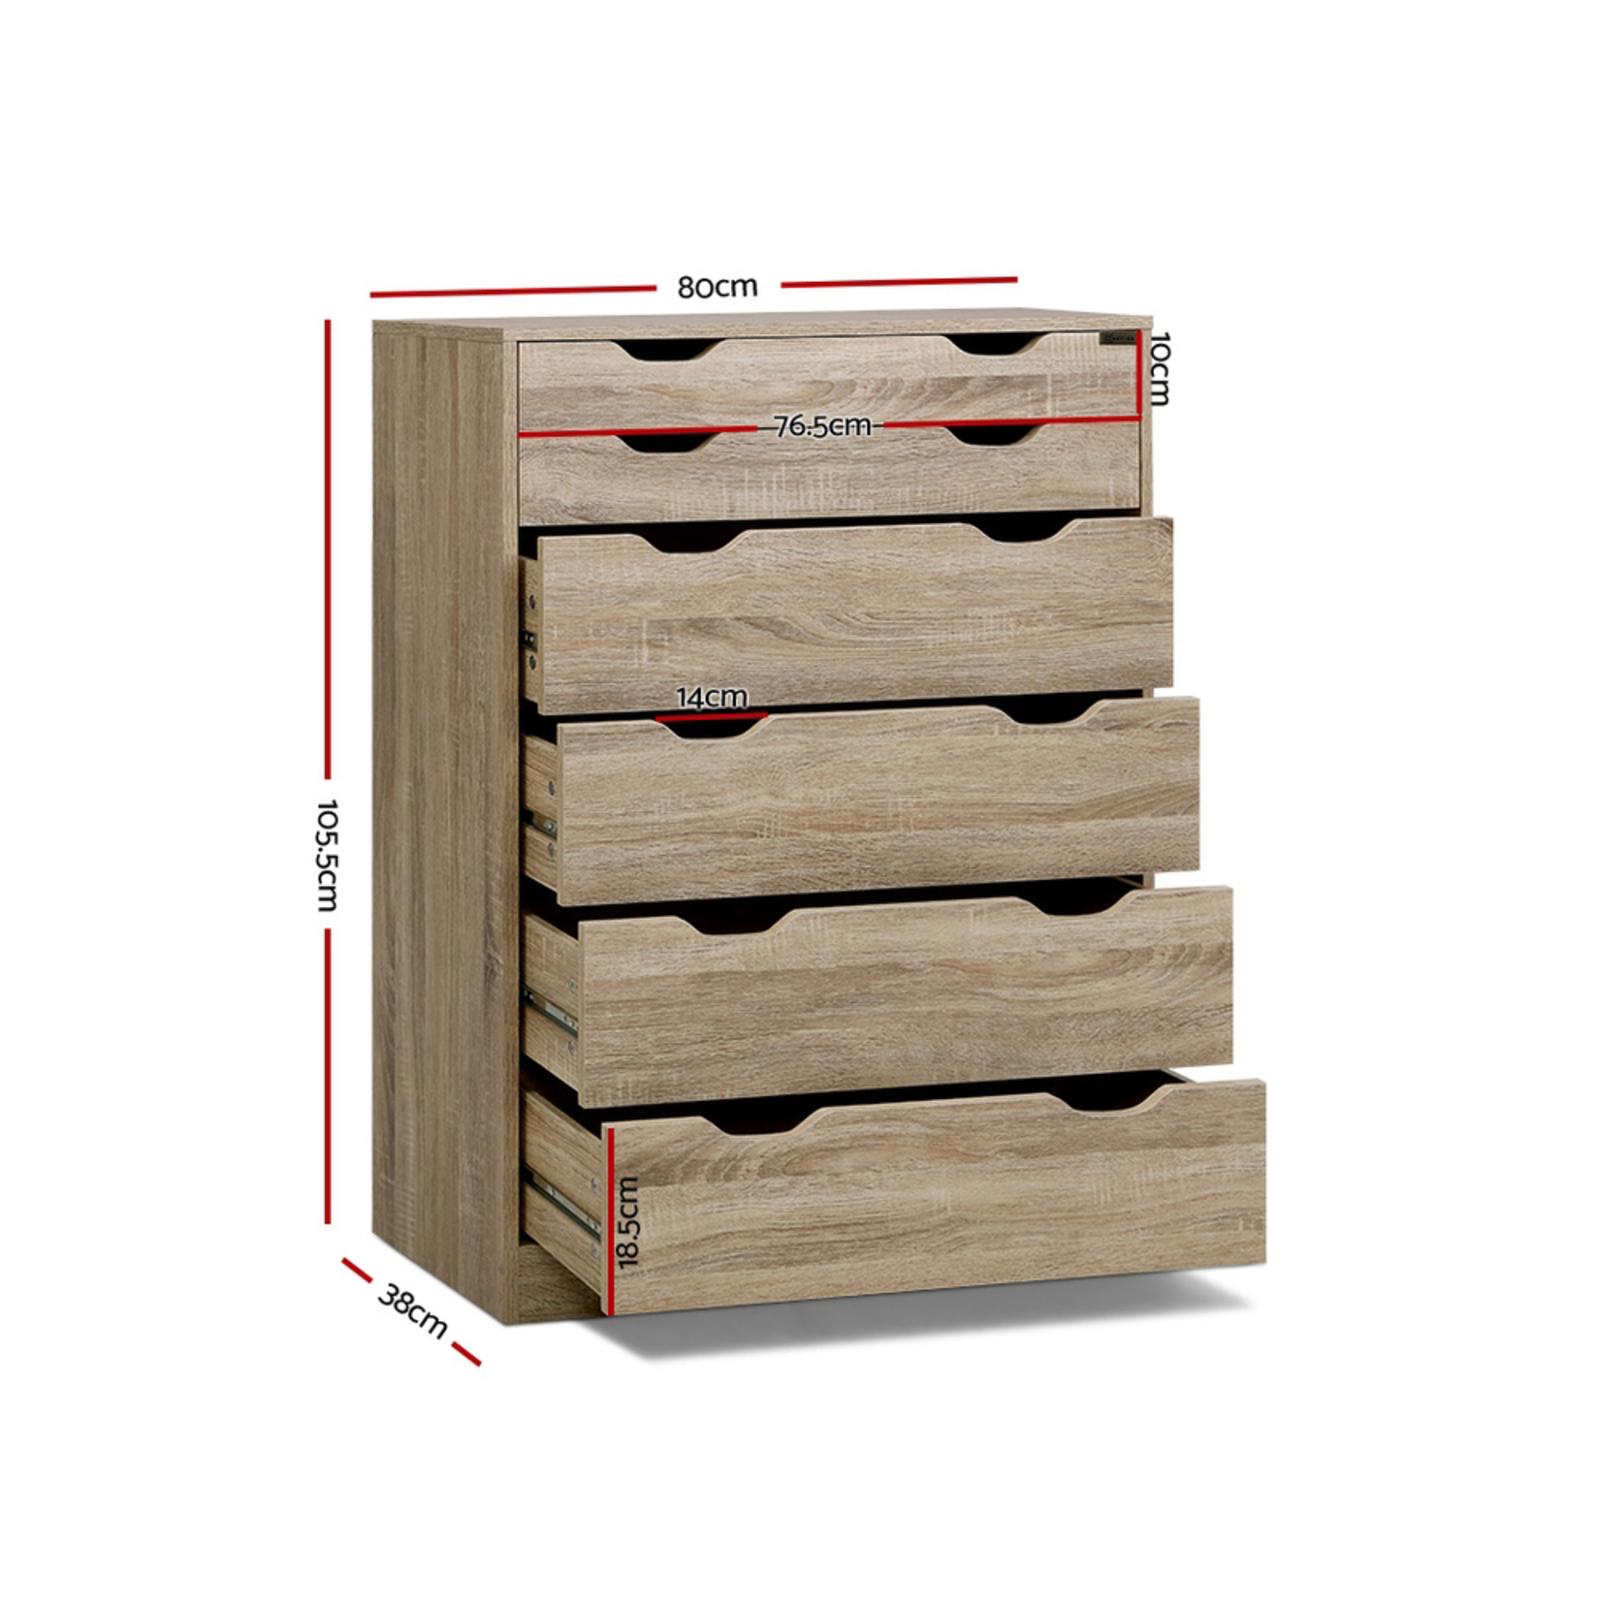 Artiss 6 Chest Of Drawers Tallboy Dresser Table Storage Cabinet Oak Bedroom Bunnings Australia